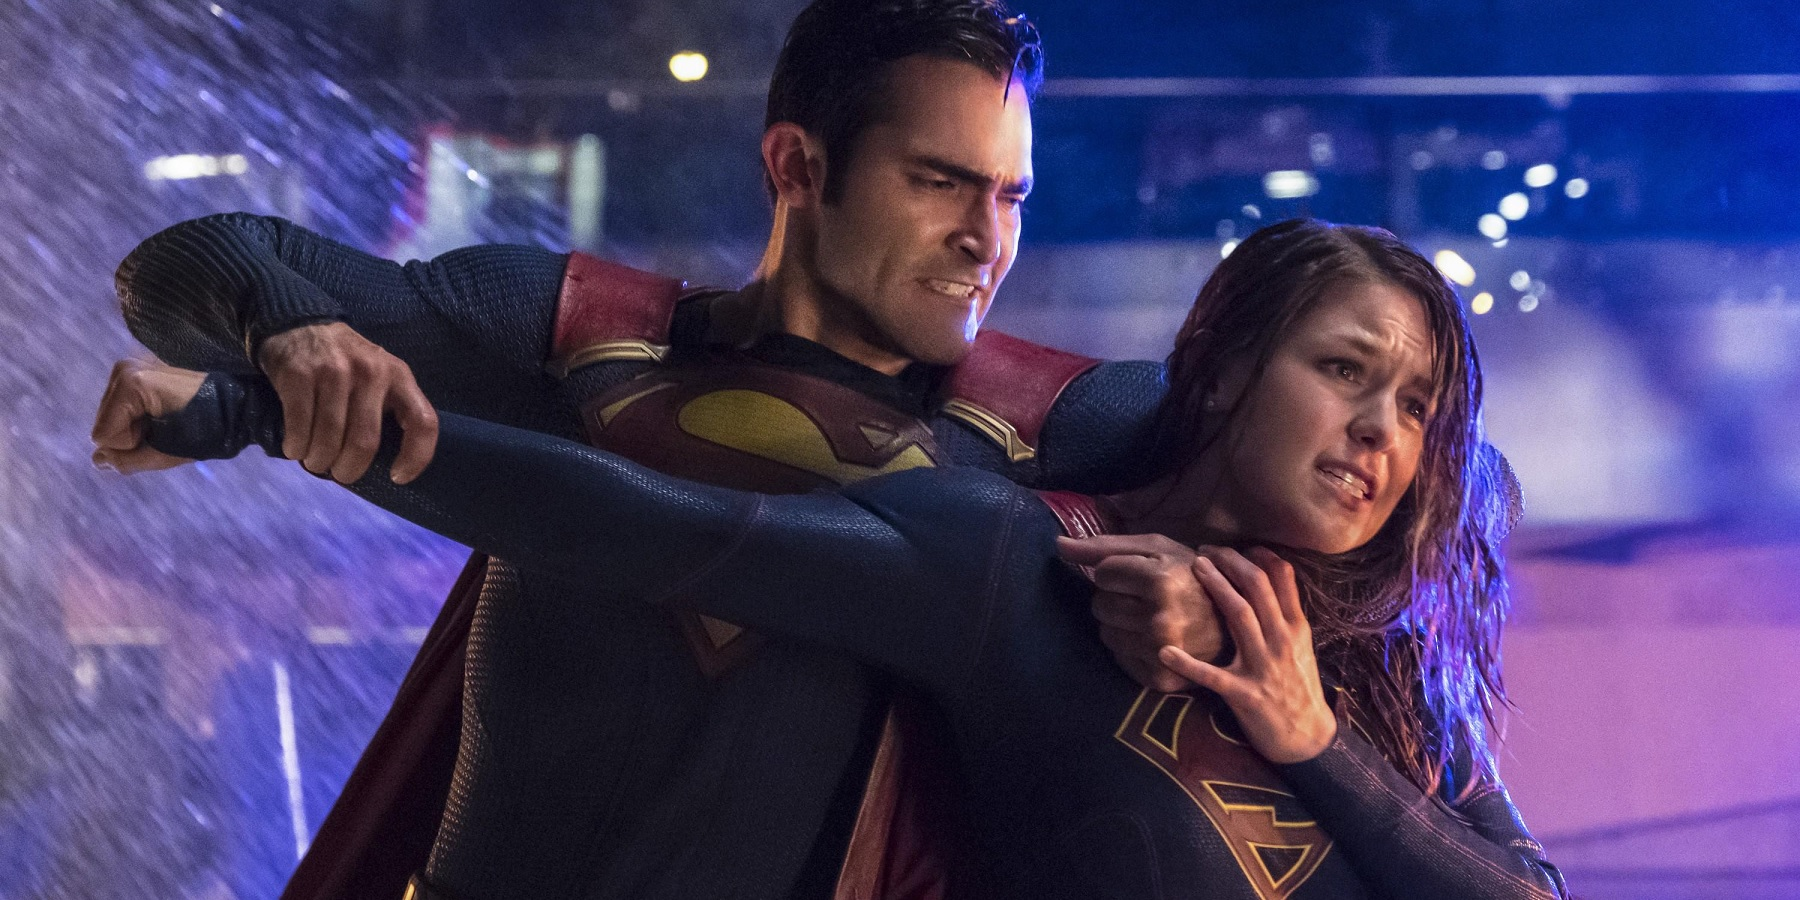 Supergirl season 2 finale - Evil Superman